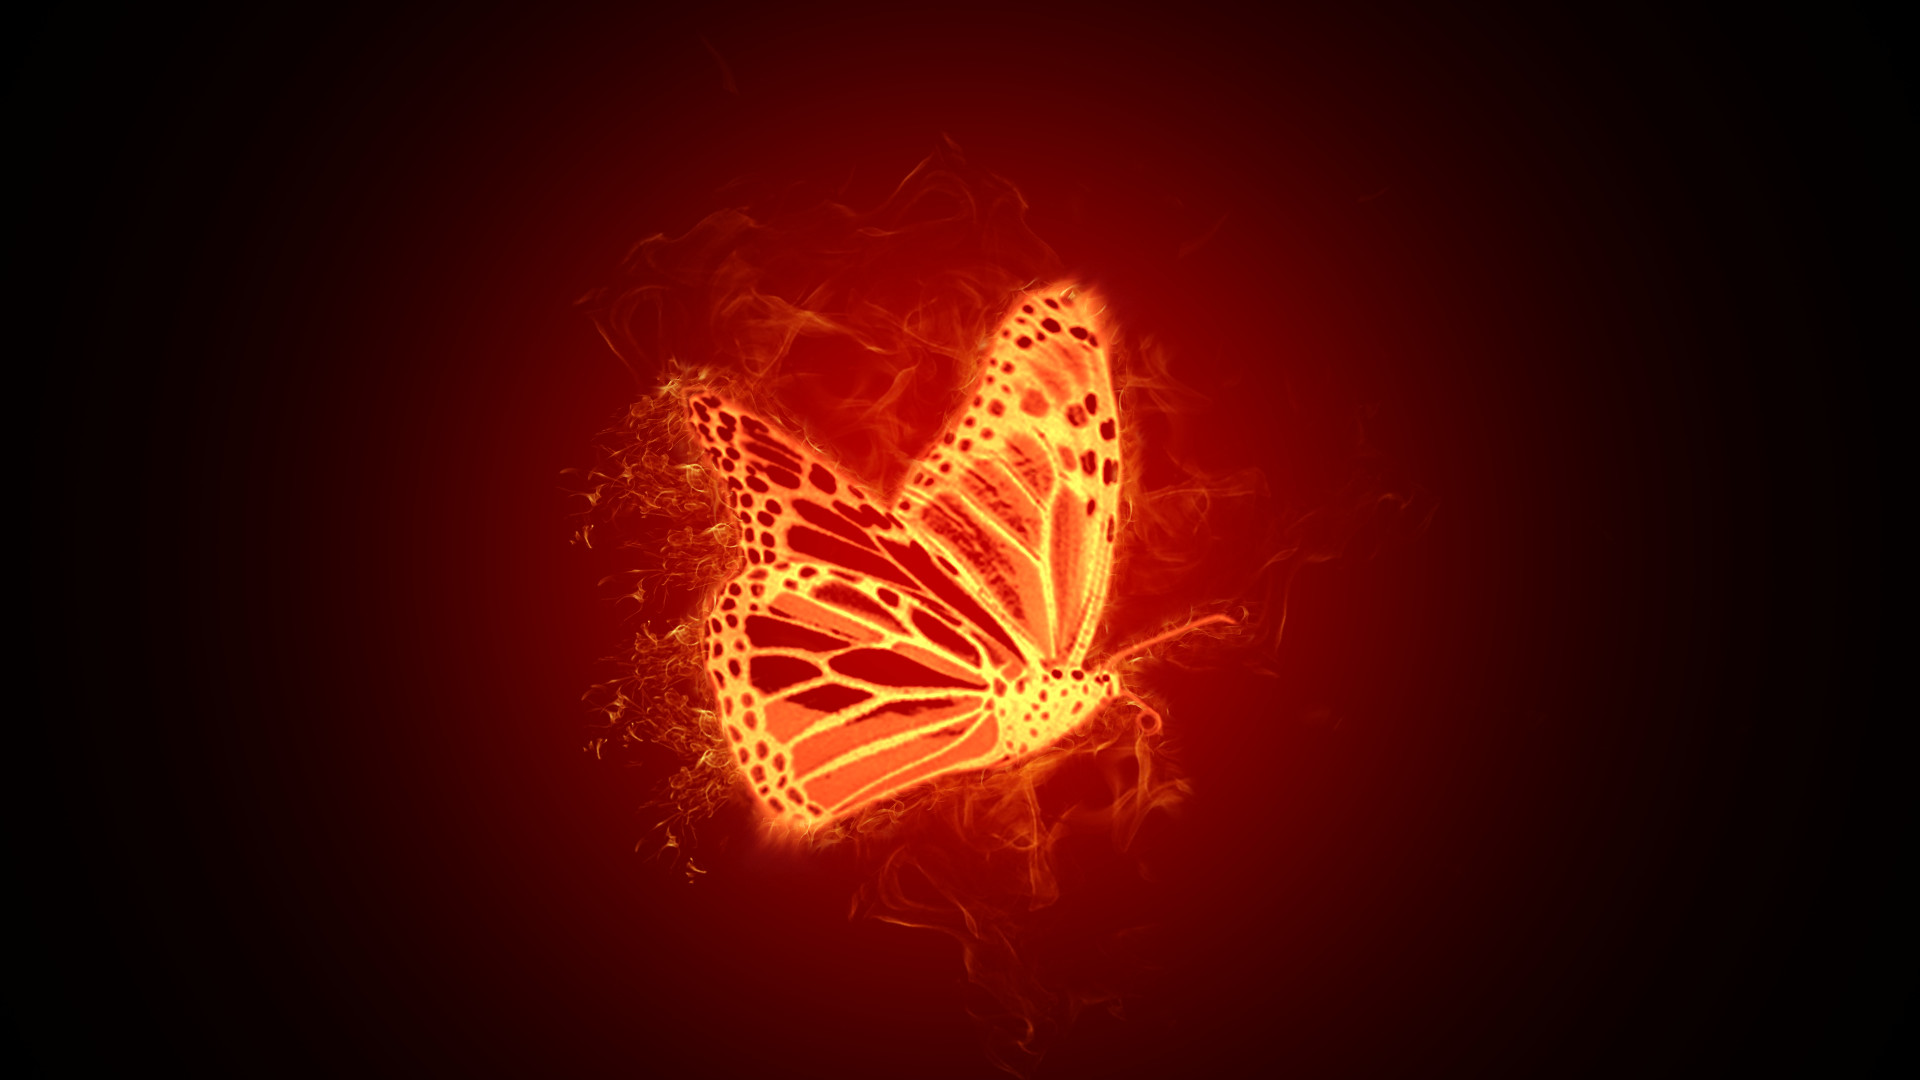 Res: 1920x1080, butterfly wallpaper fire